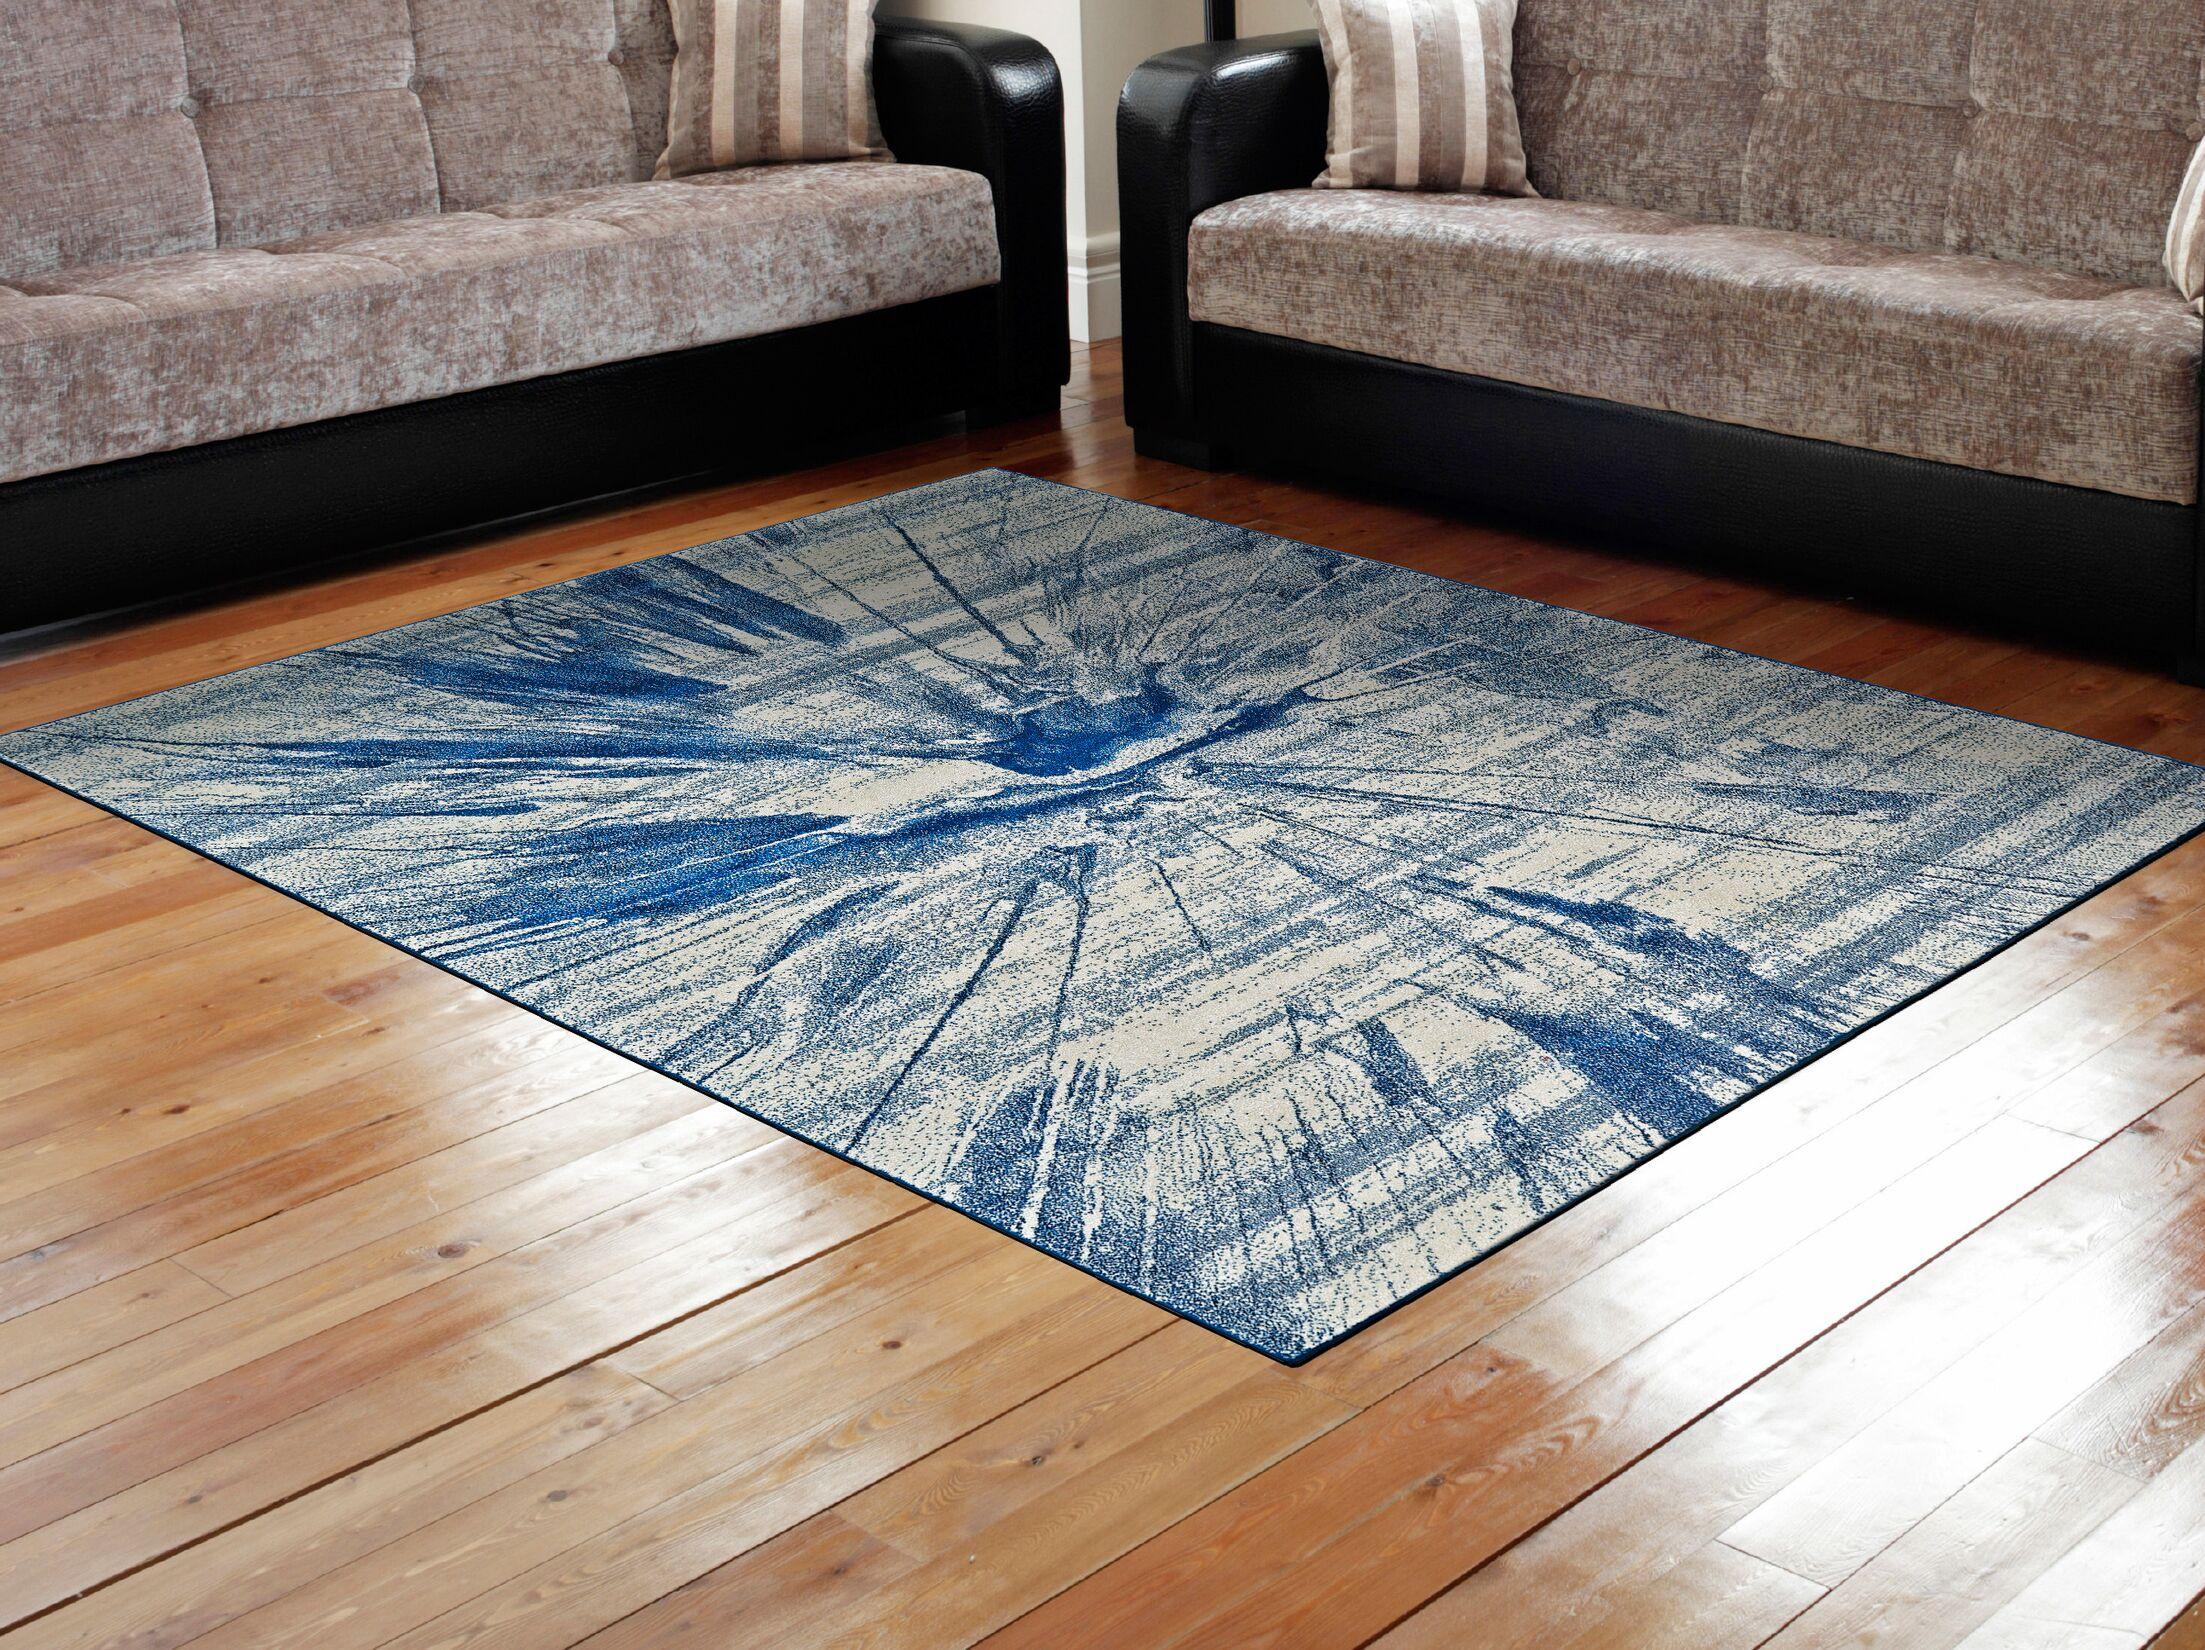 Peasedown St John Cobalt Blue Area Rug Rug Size: Rectangle 8' x 11'